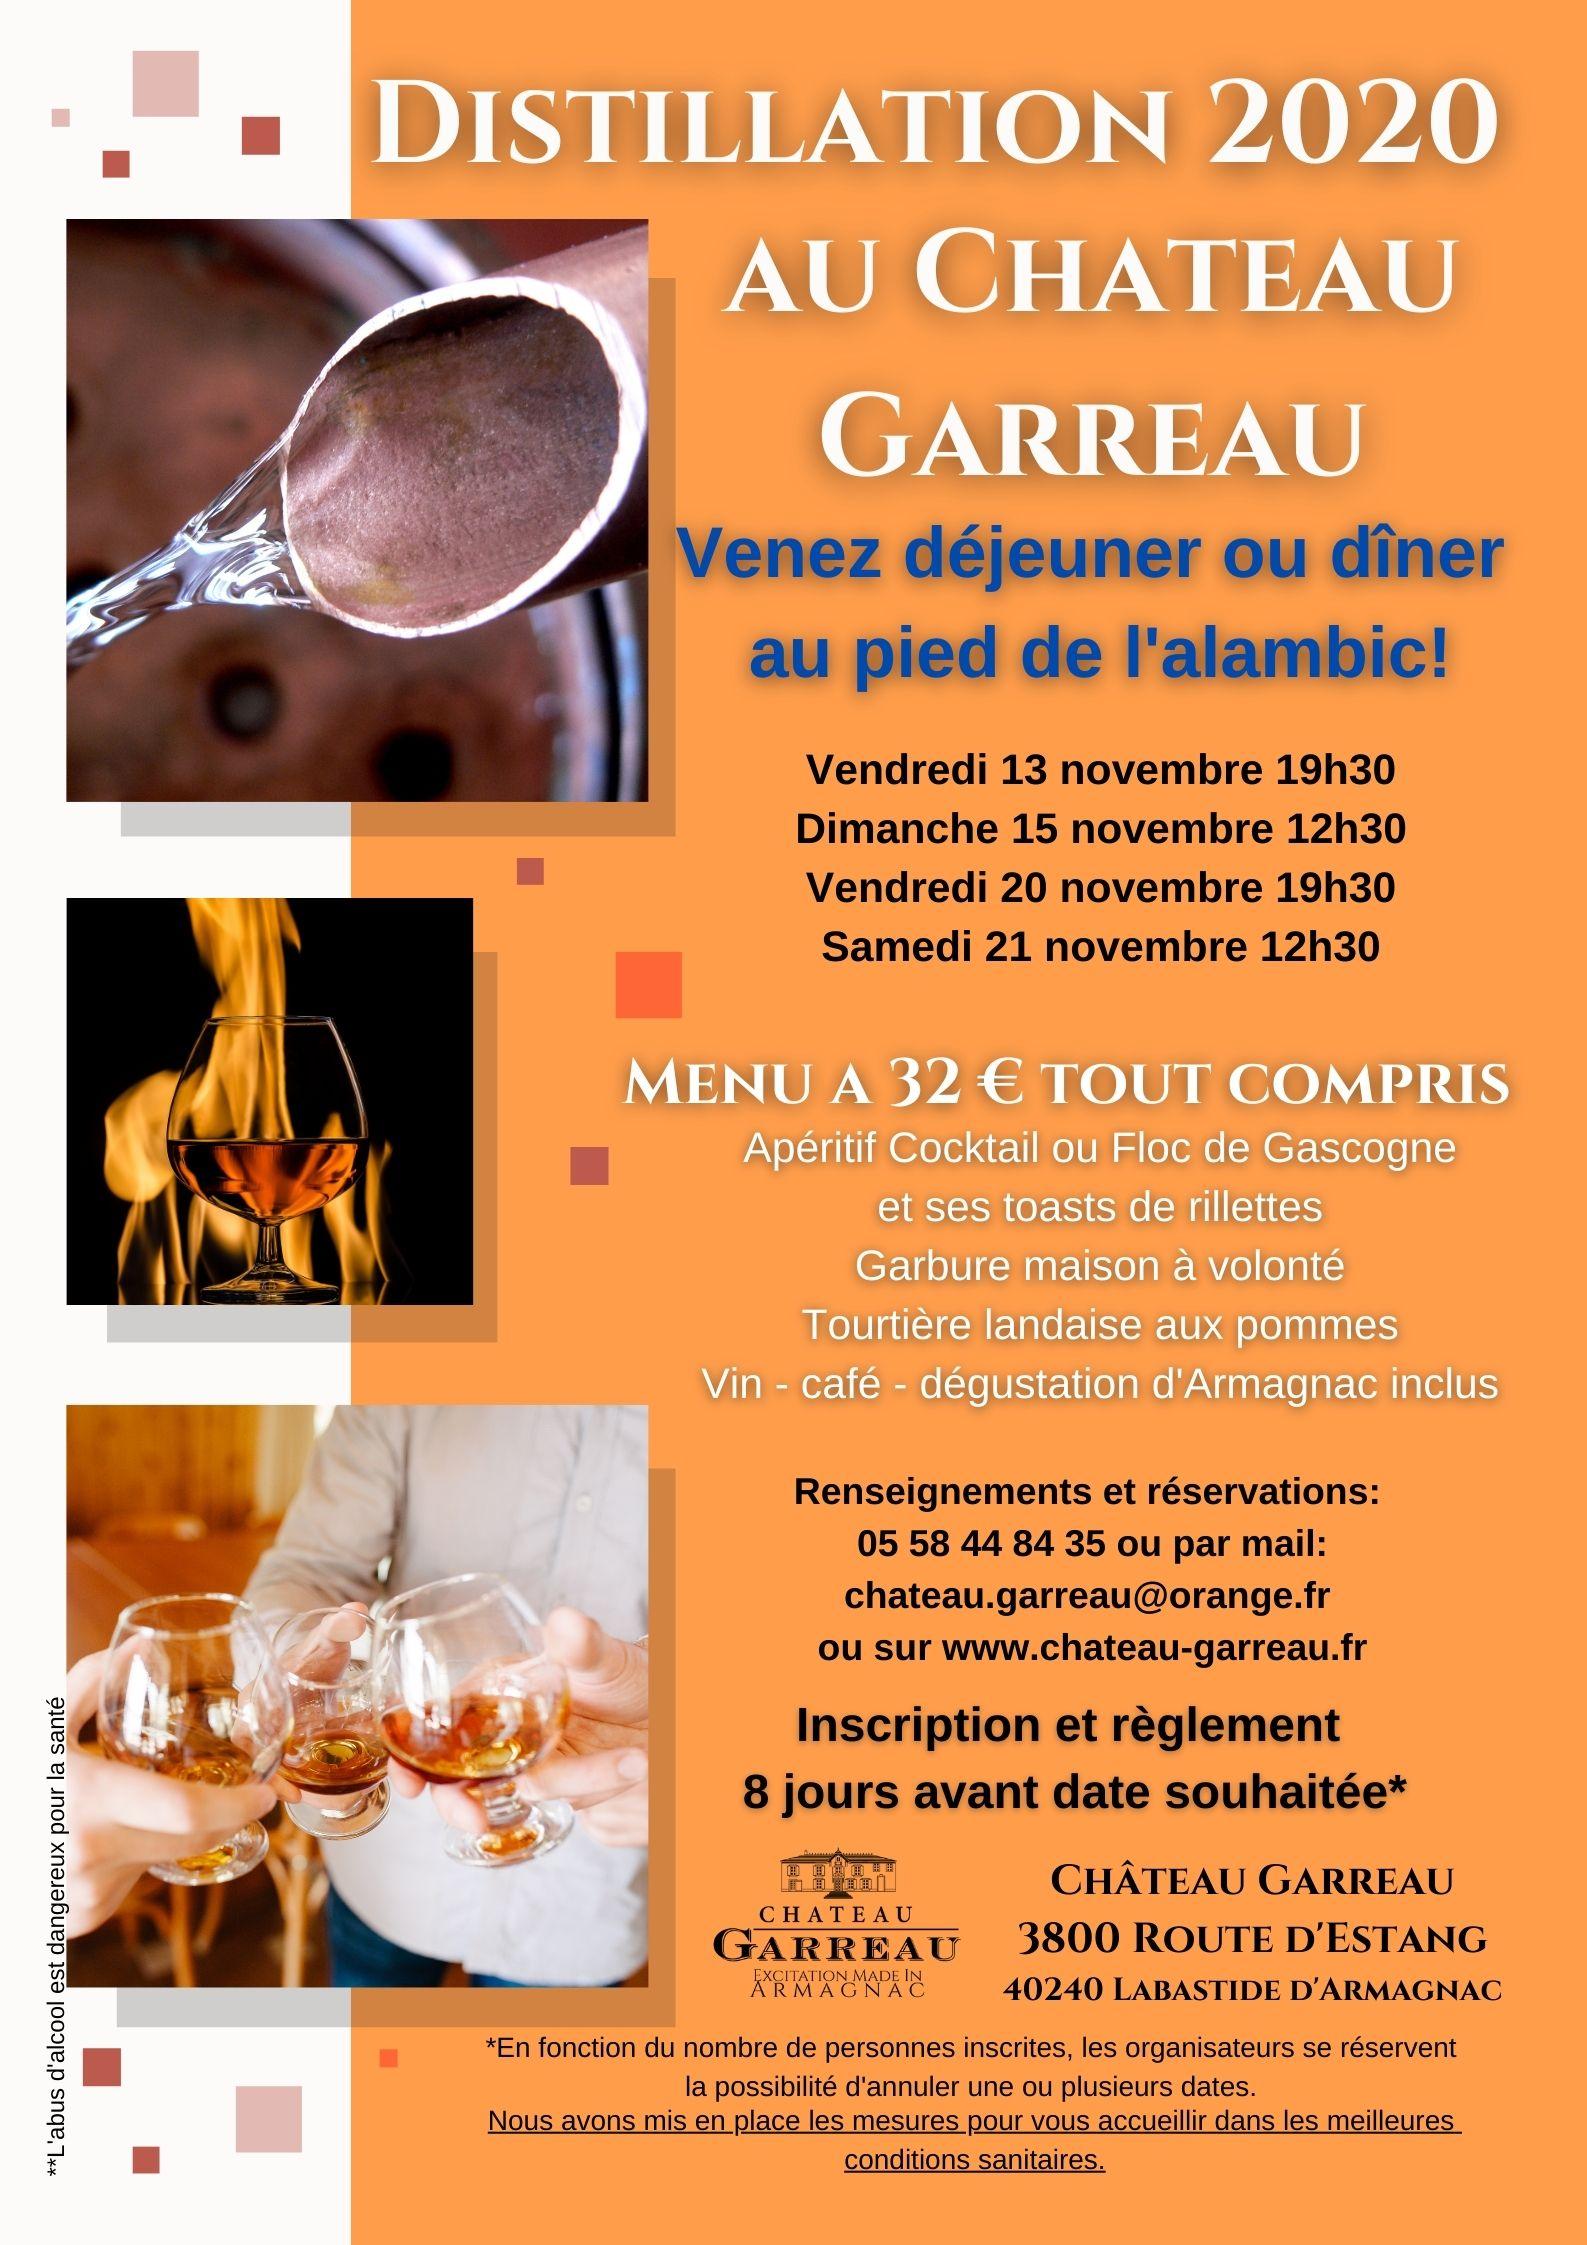 Distillation 2020 Armagnac Château Garreau Labastide d'Armagnac